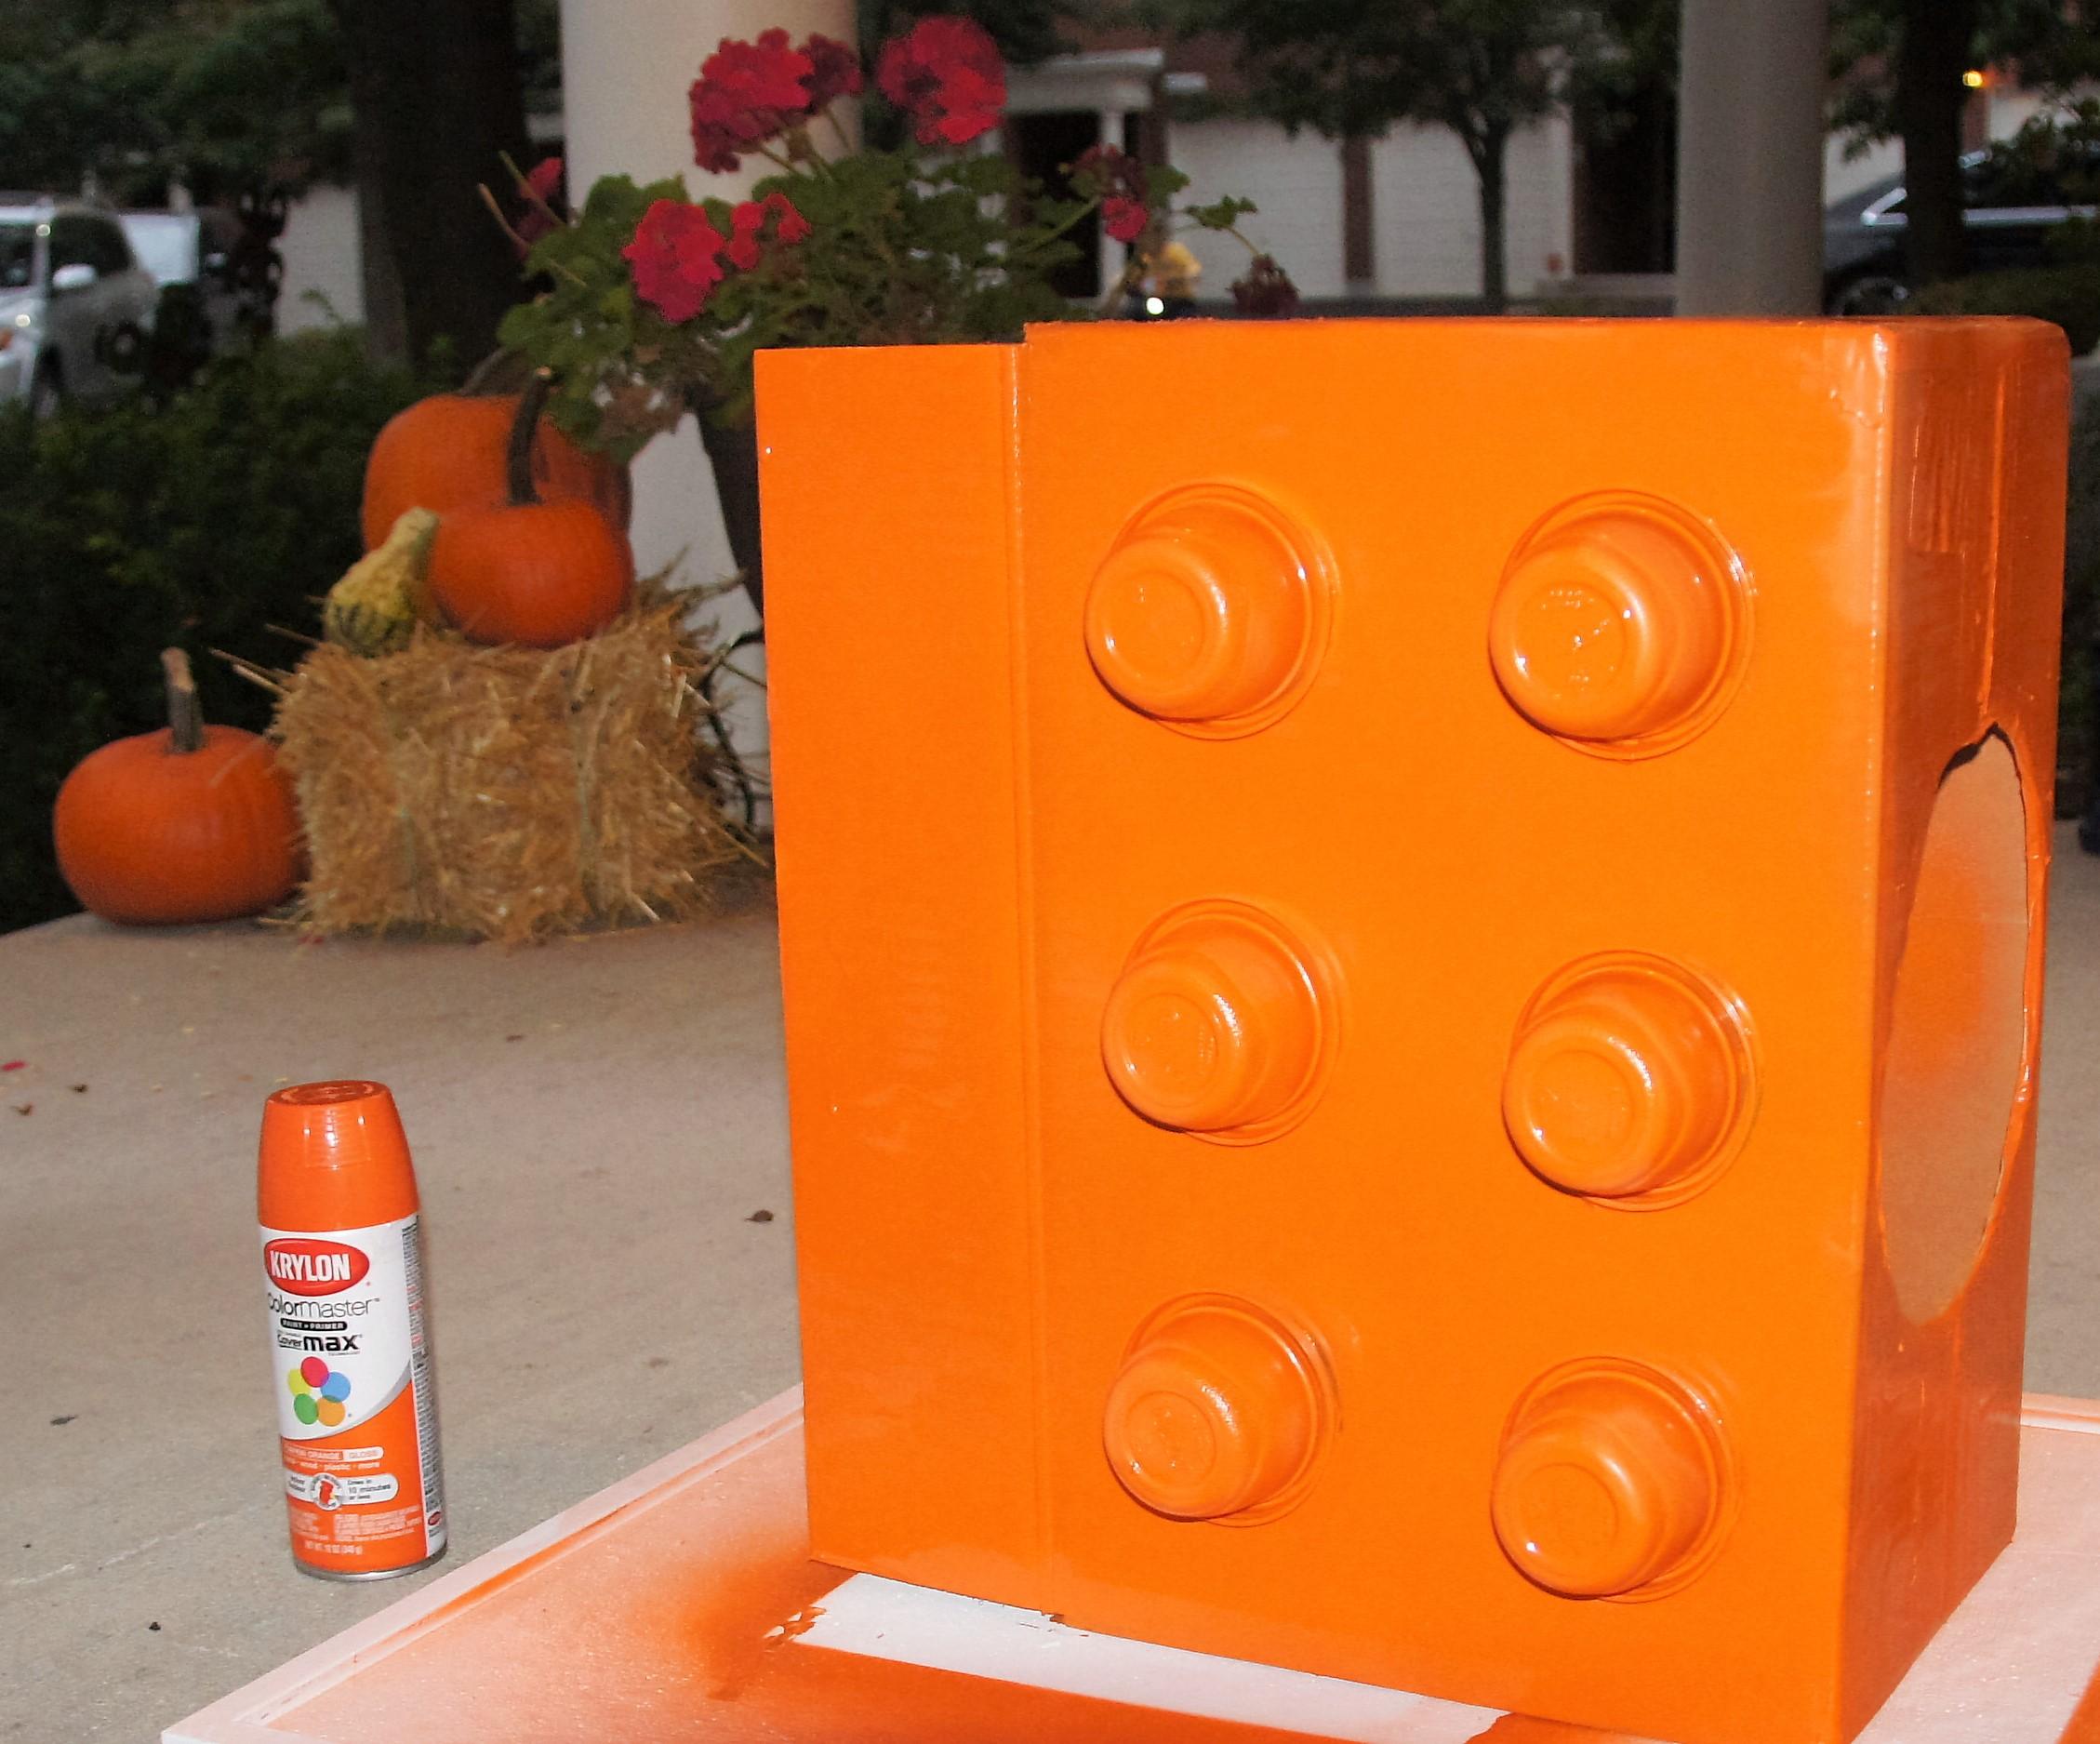 Lego Project: Orange Box Spray Painted